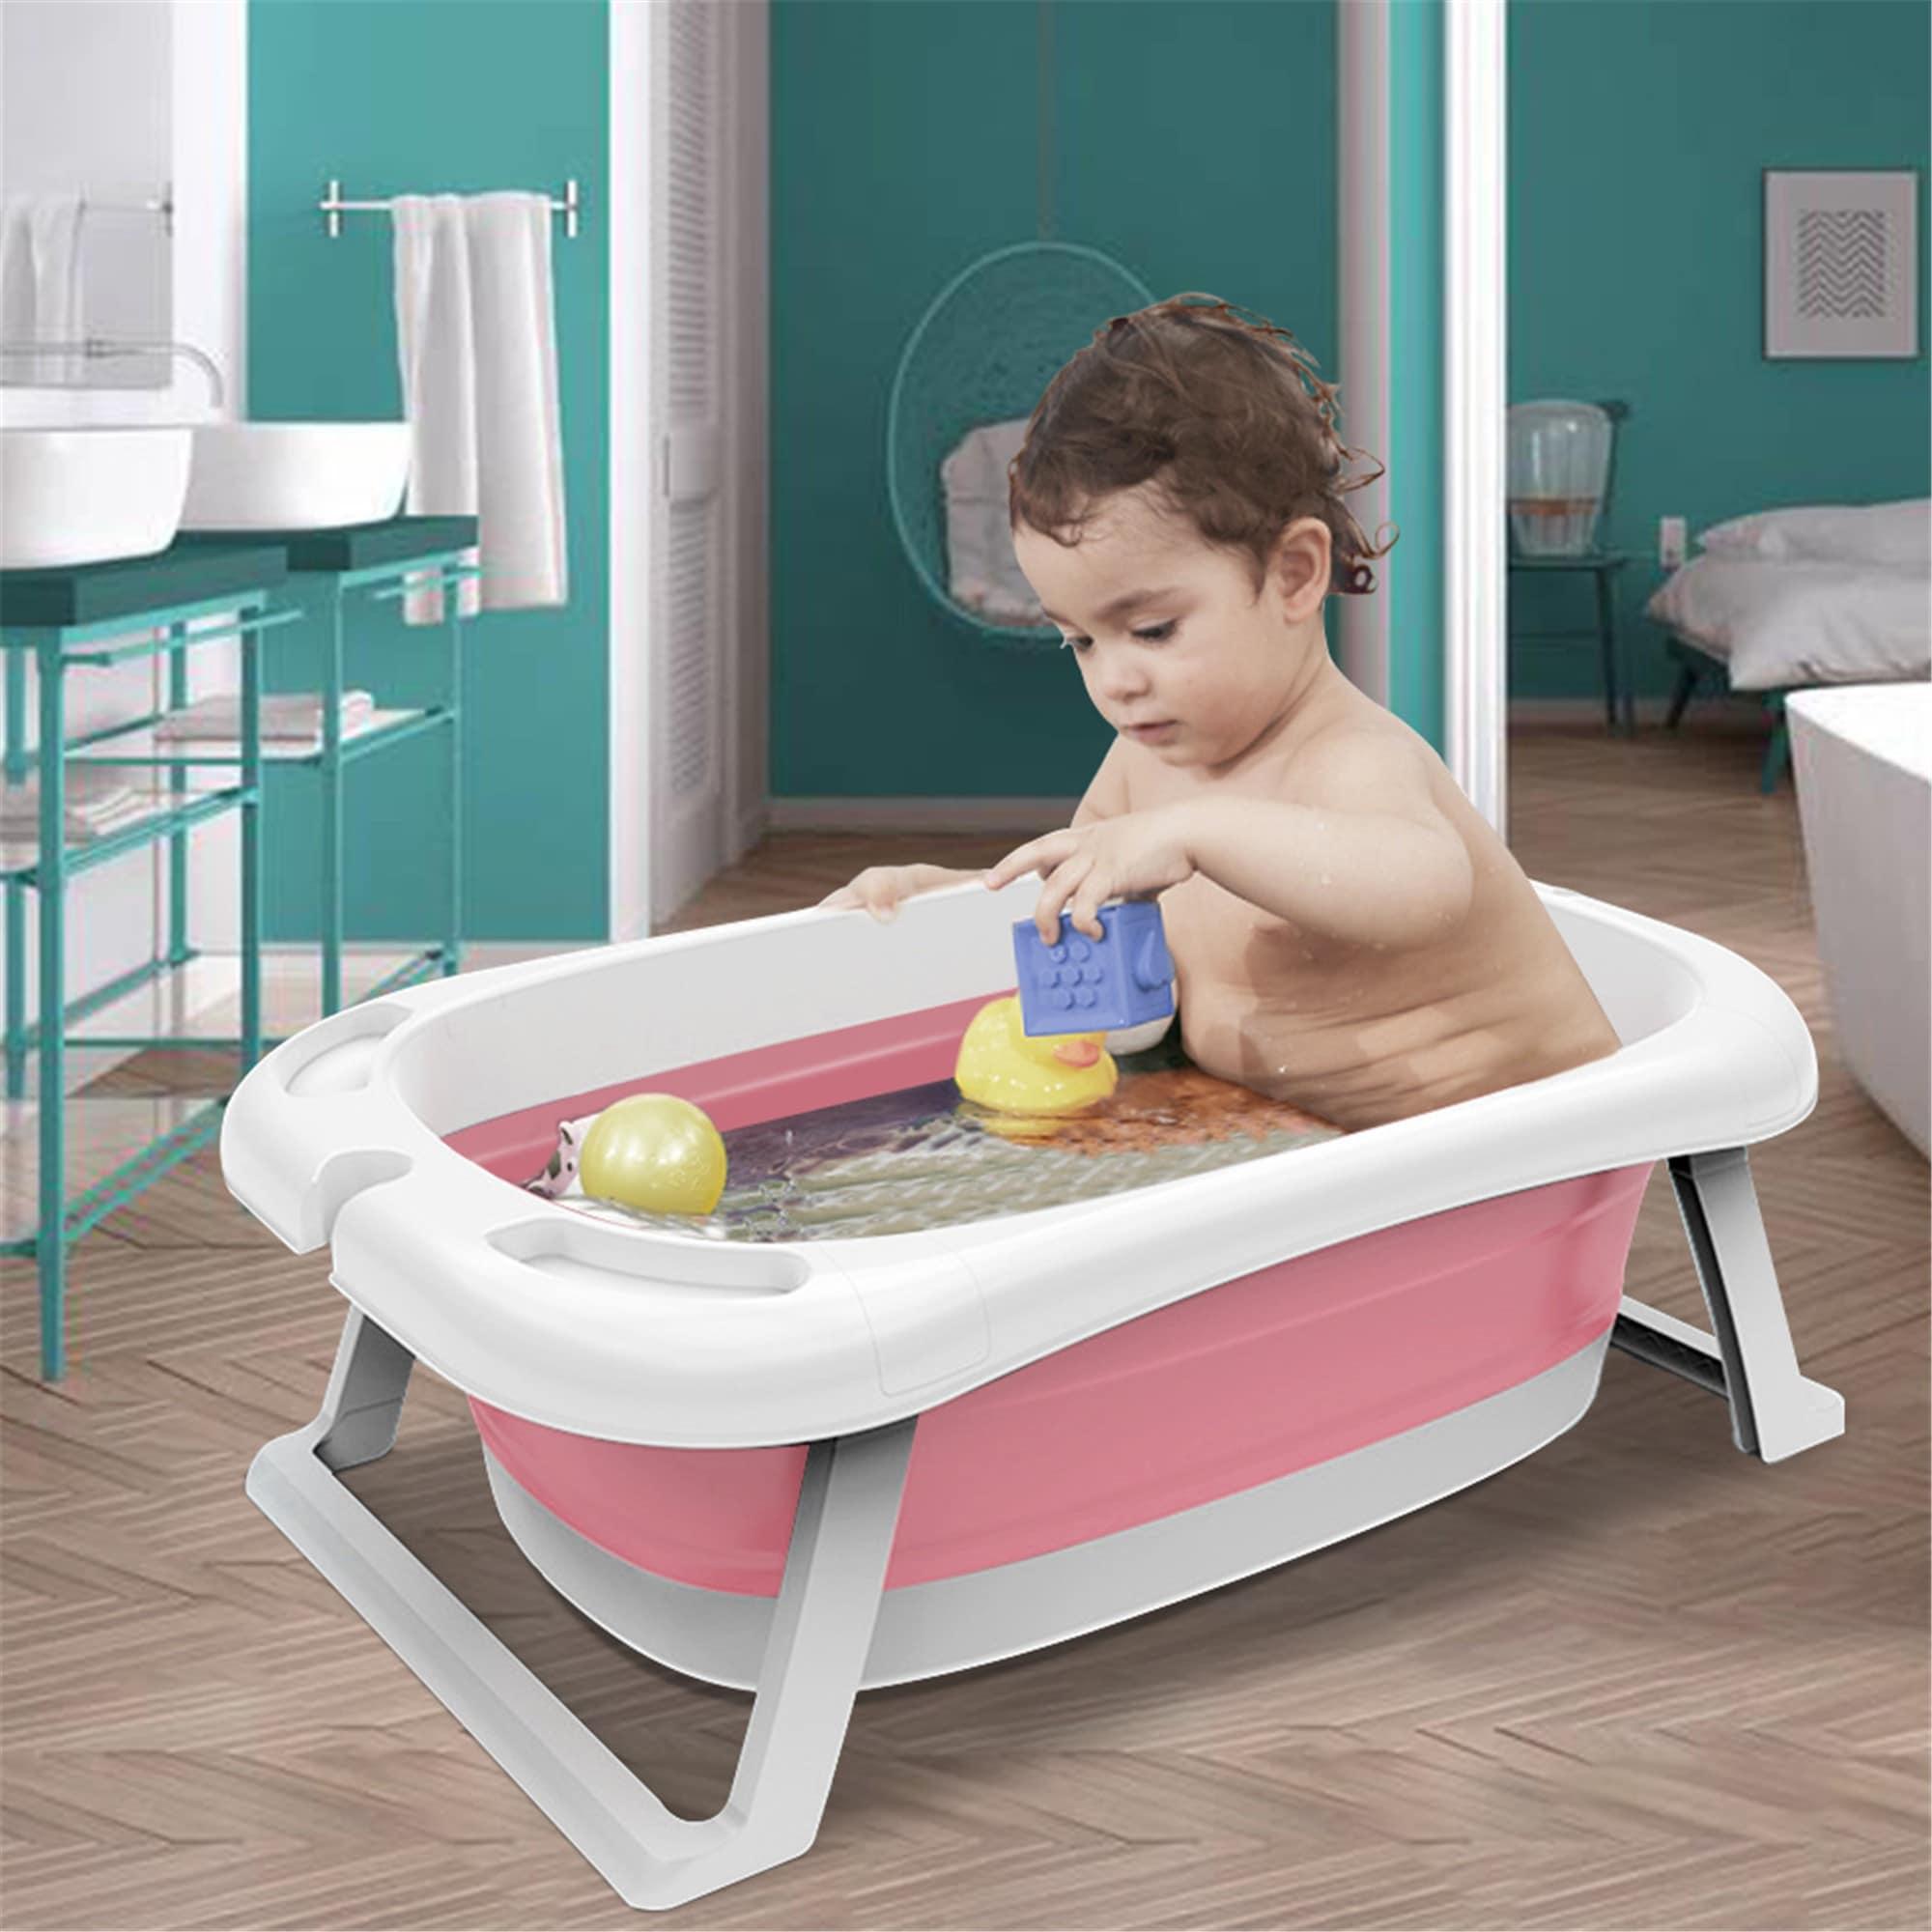 Shop Black Friday Deals On Portable Baby Bathtub Bath Tub Foldable Travel Shower Basing For Newborn Infant Kids Pink Overstock 31717412